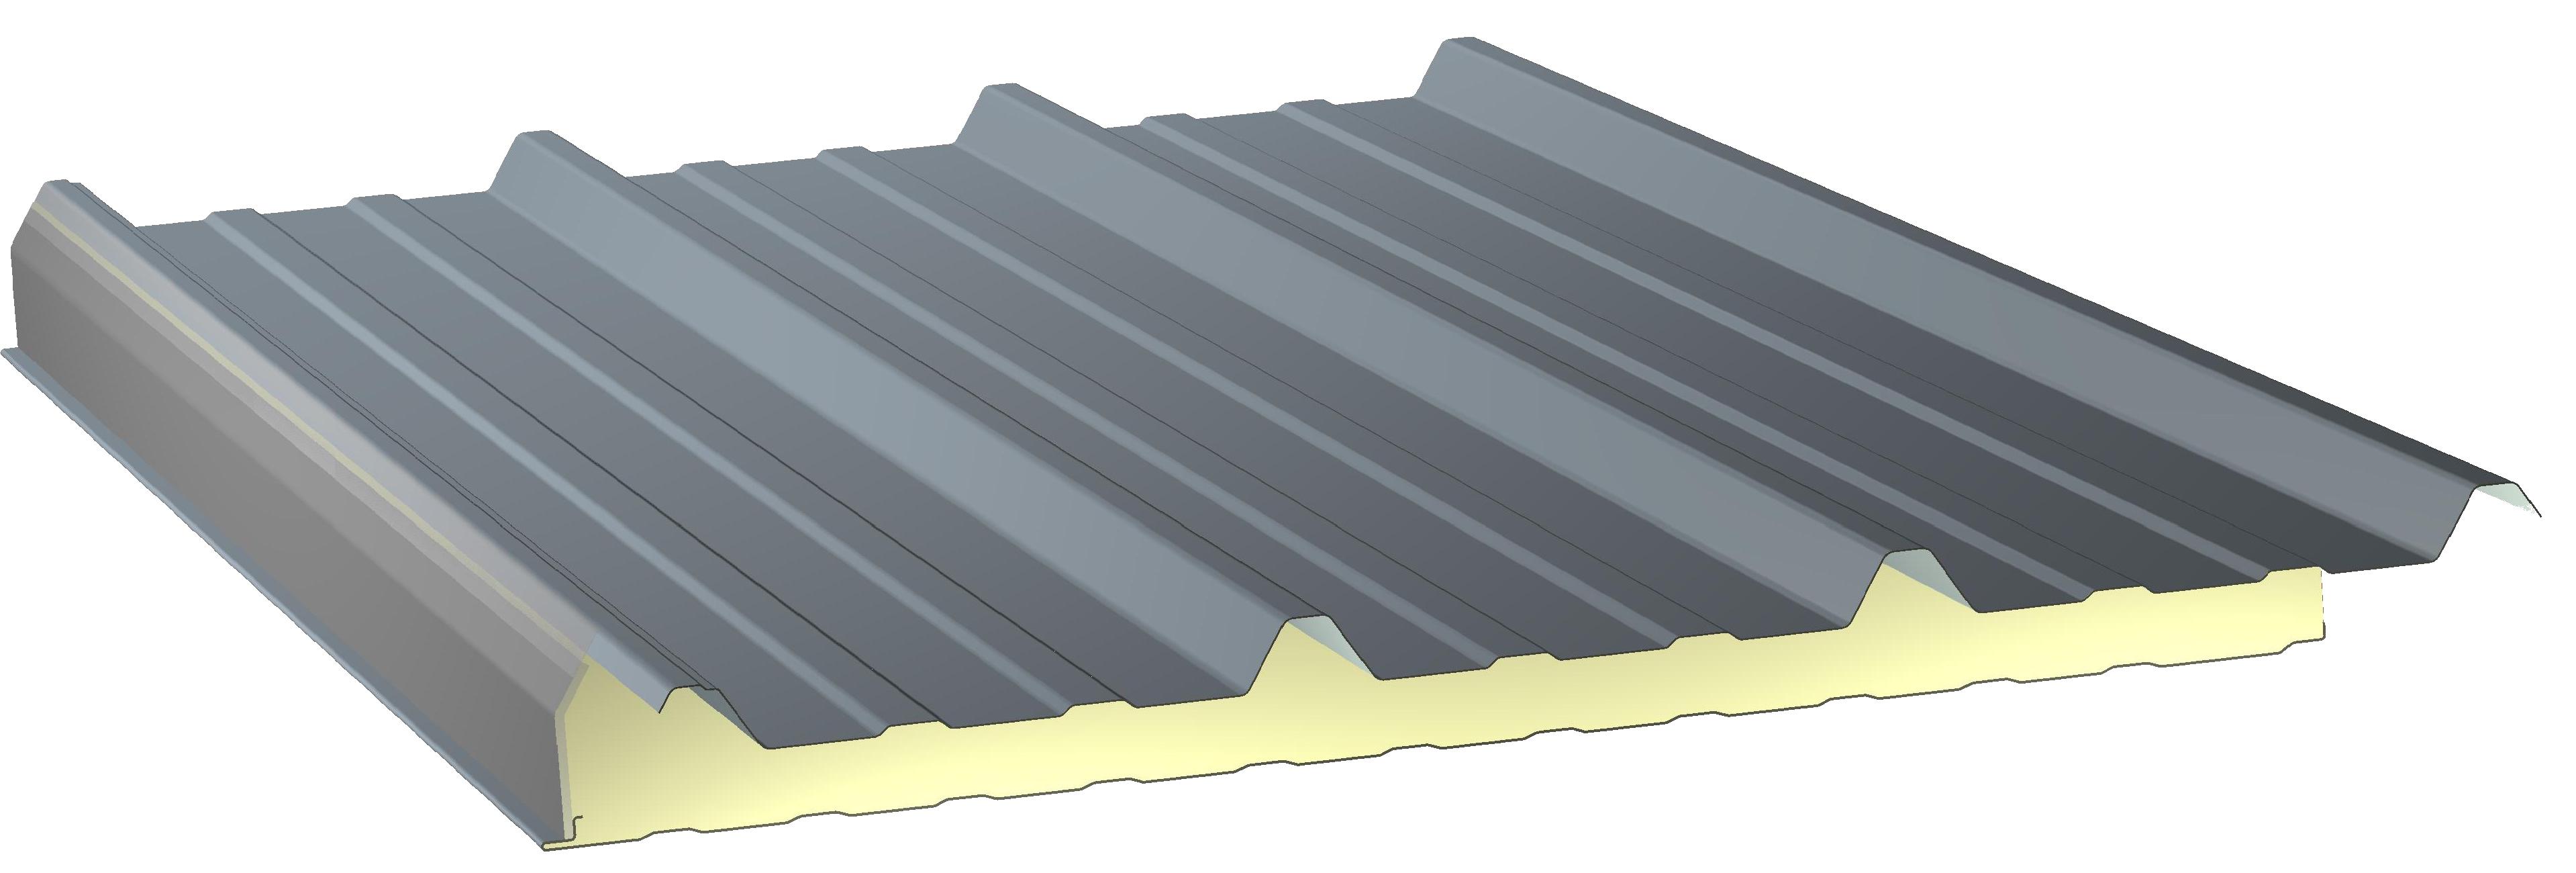 Panneau Ondatherm T ArcelorMittal